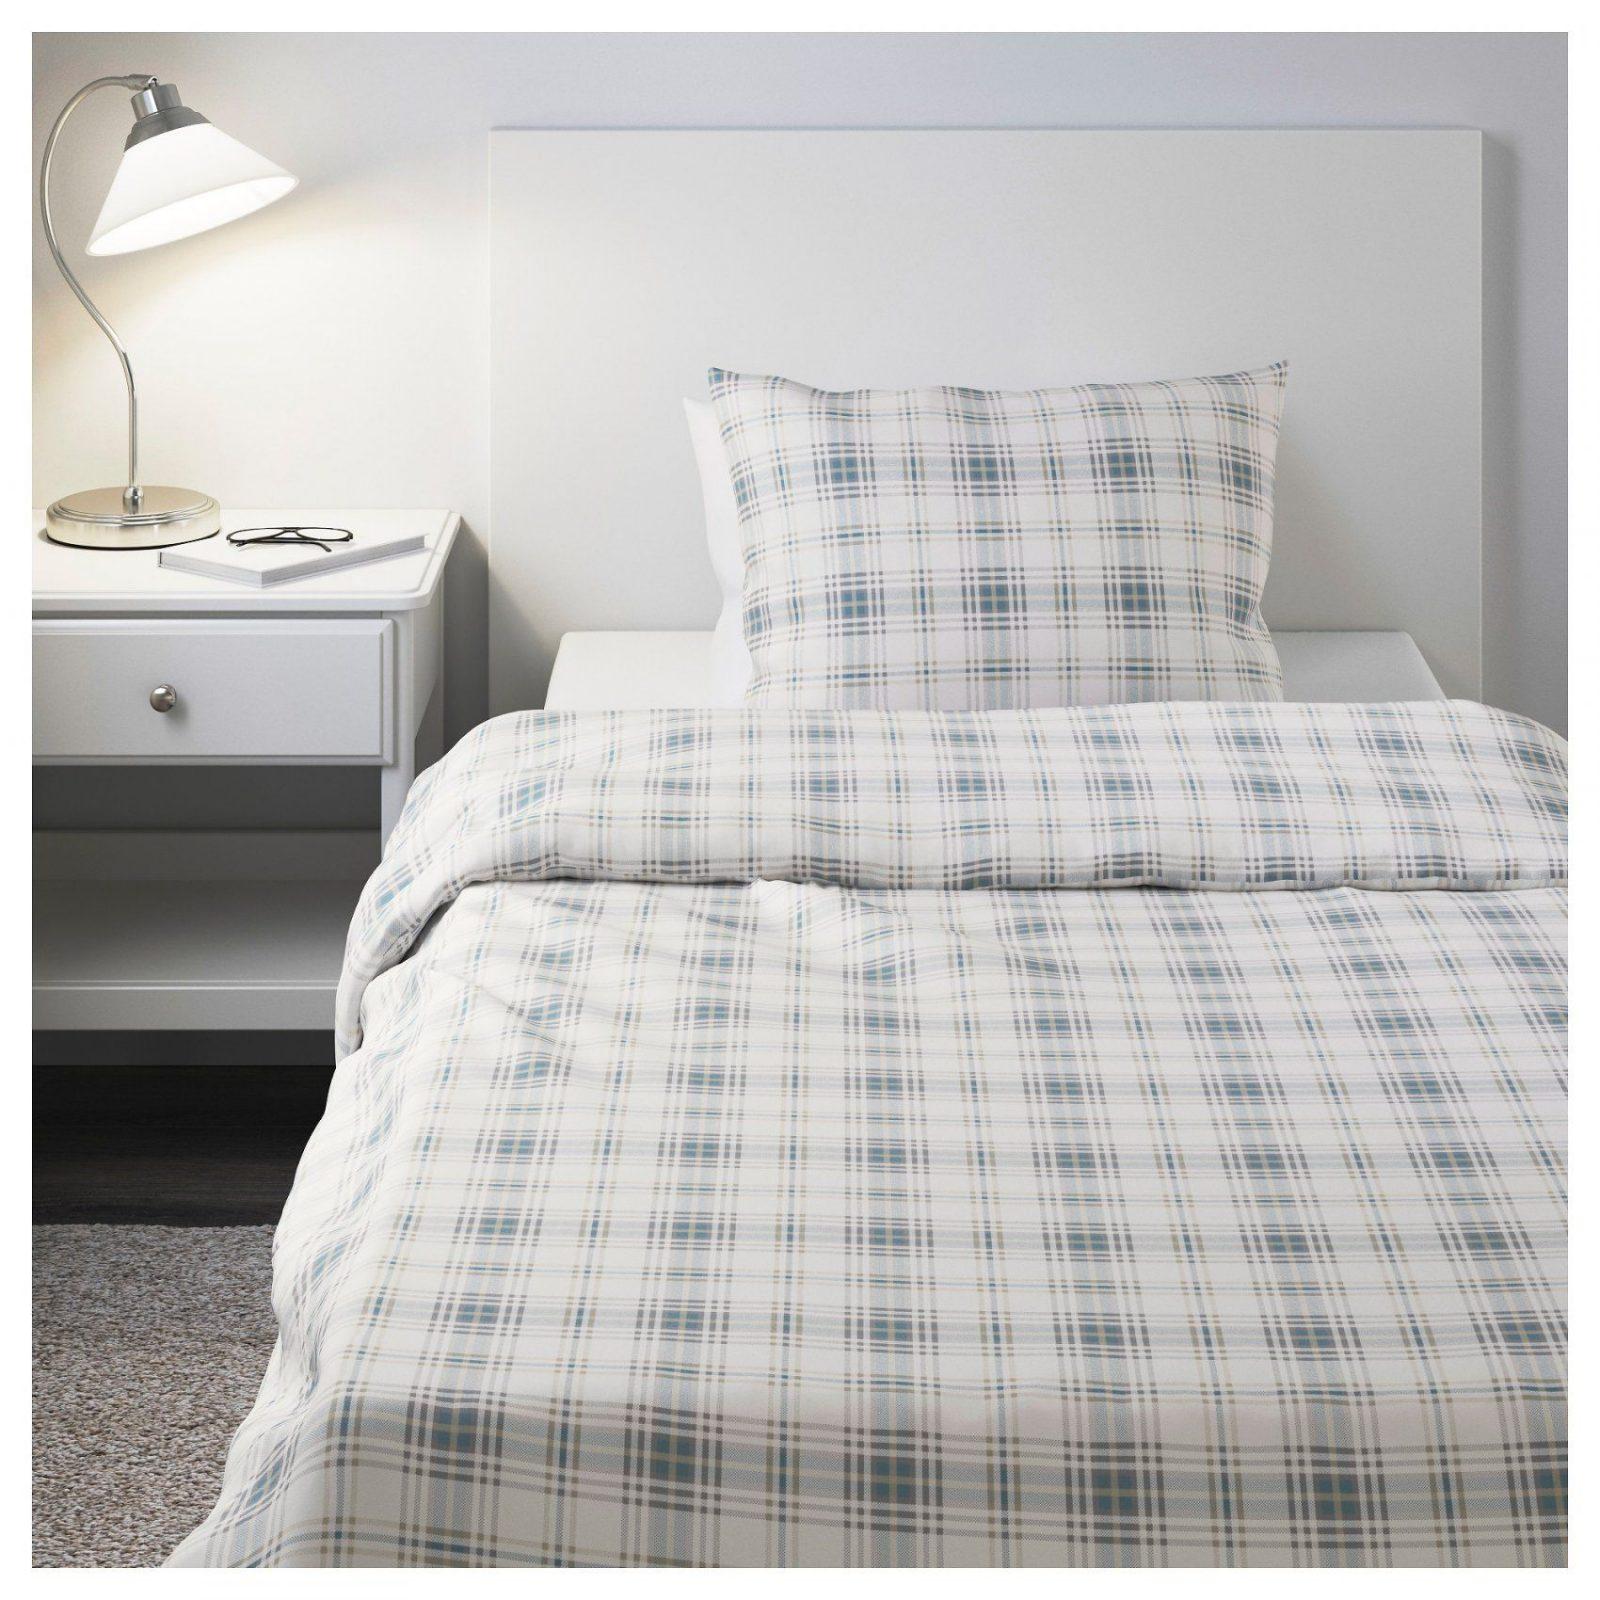 ikea bettw sche biber 3 kammer kopfkissen 80x80. Black Bedroom Furniture Sets. Home Design Ideas